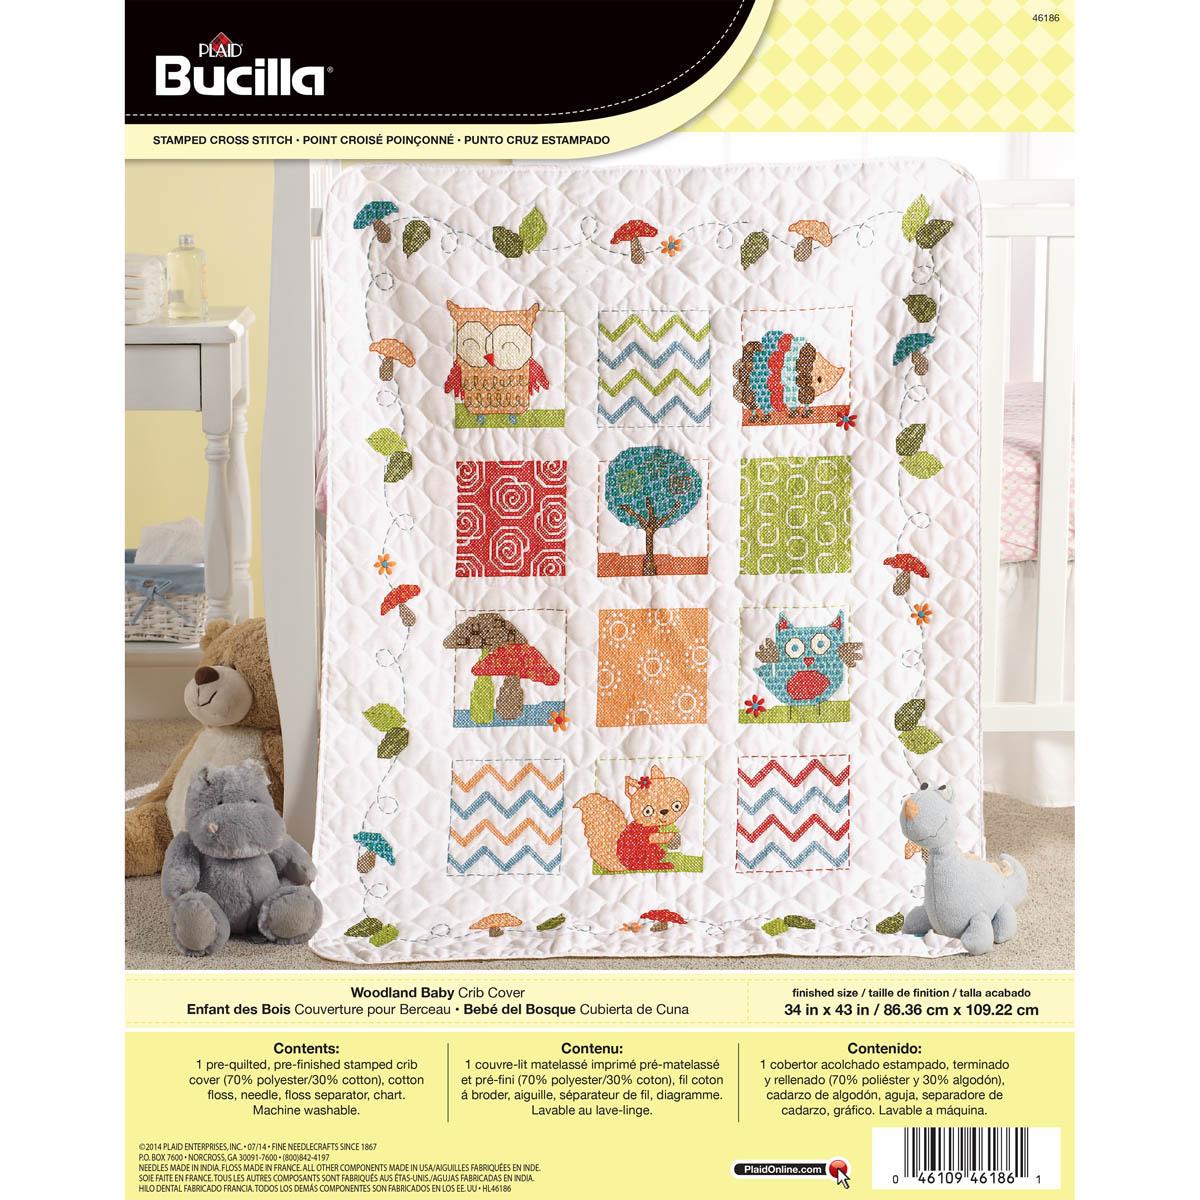 Bucilla ® Baby - Stamped Cross Stitch - Crib Ensembles - Woodland Baby - Crib Cover